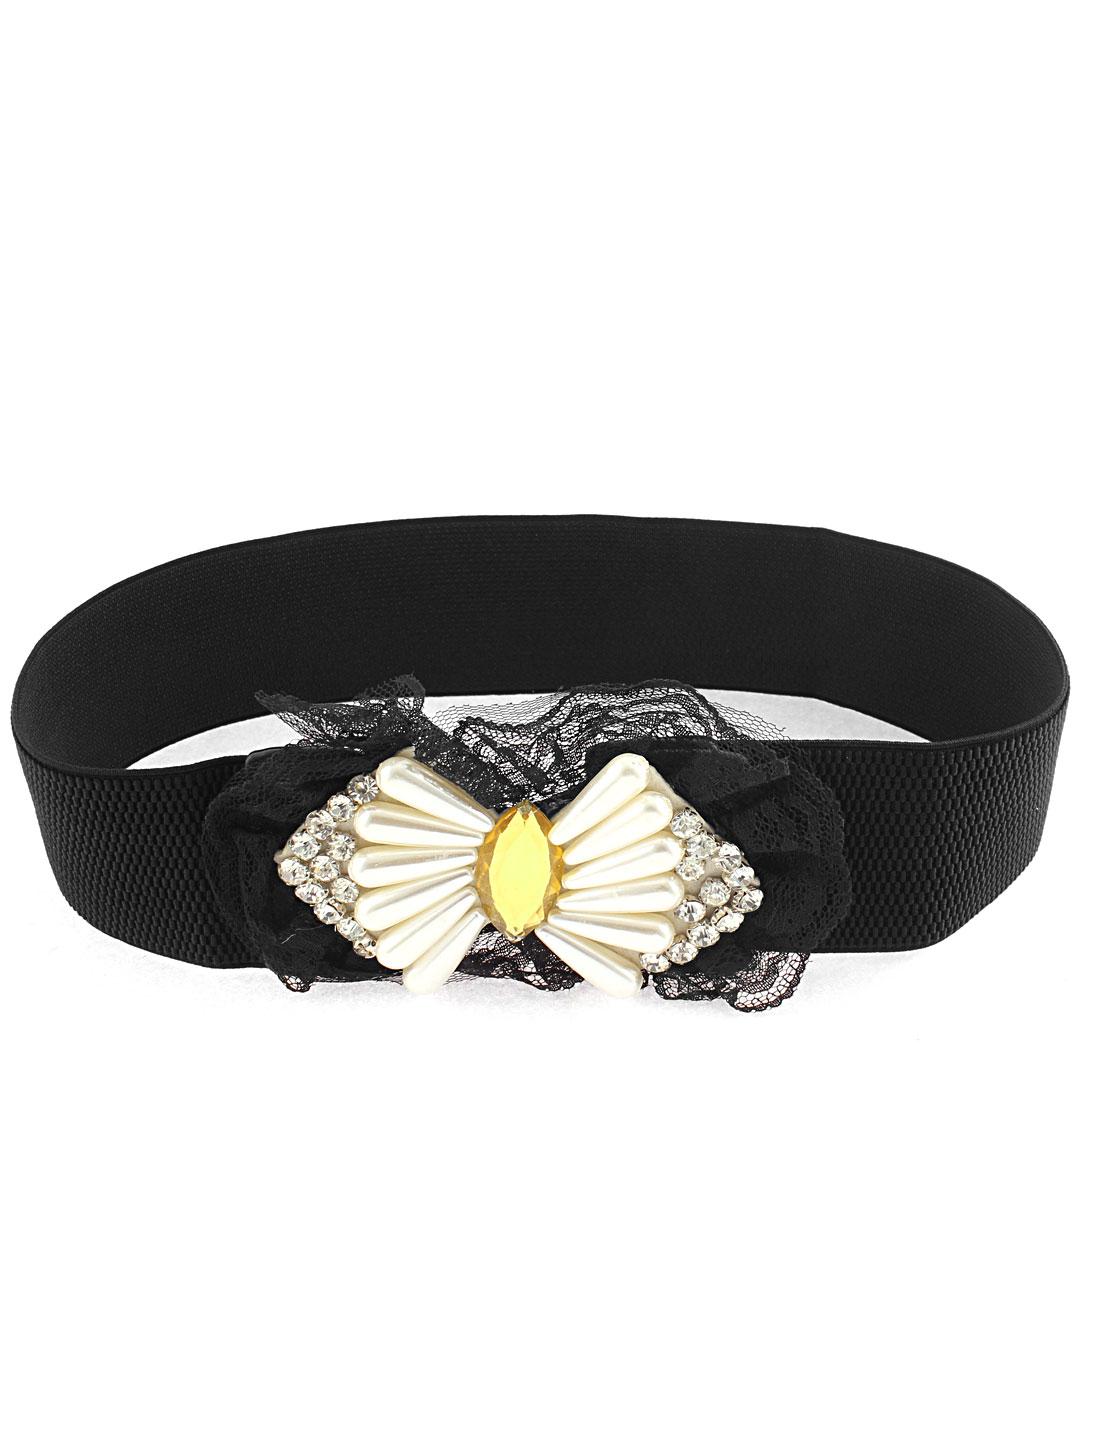 Lady Faux Pearl Crystal Rhinestone Decor Bowknot Buckle Elastic Waist Belt Black